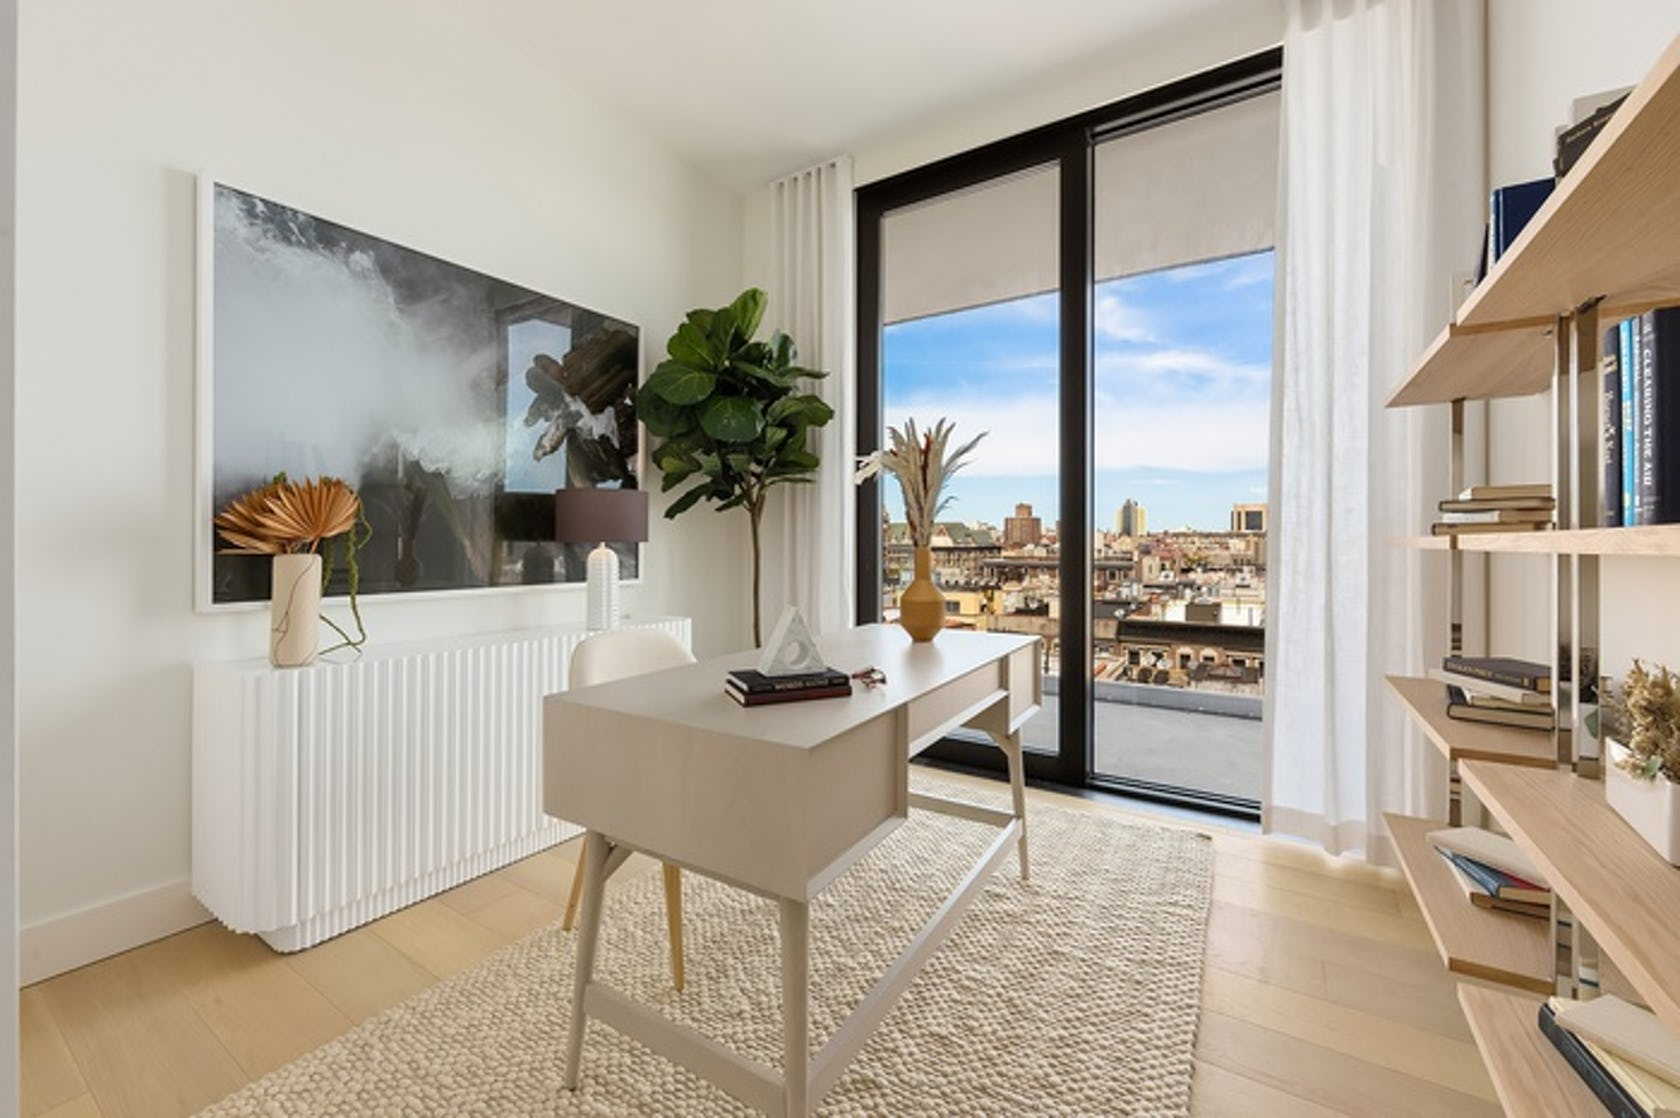 interior design indoors wood housing building furniture rug home decor